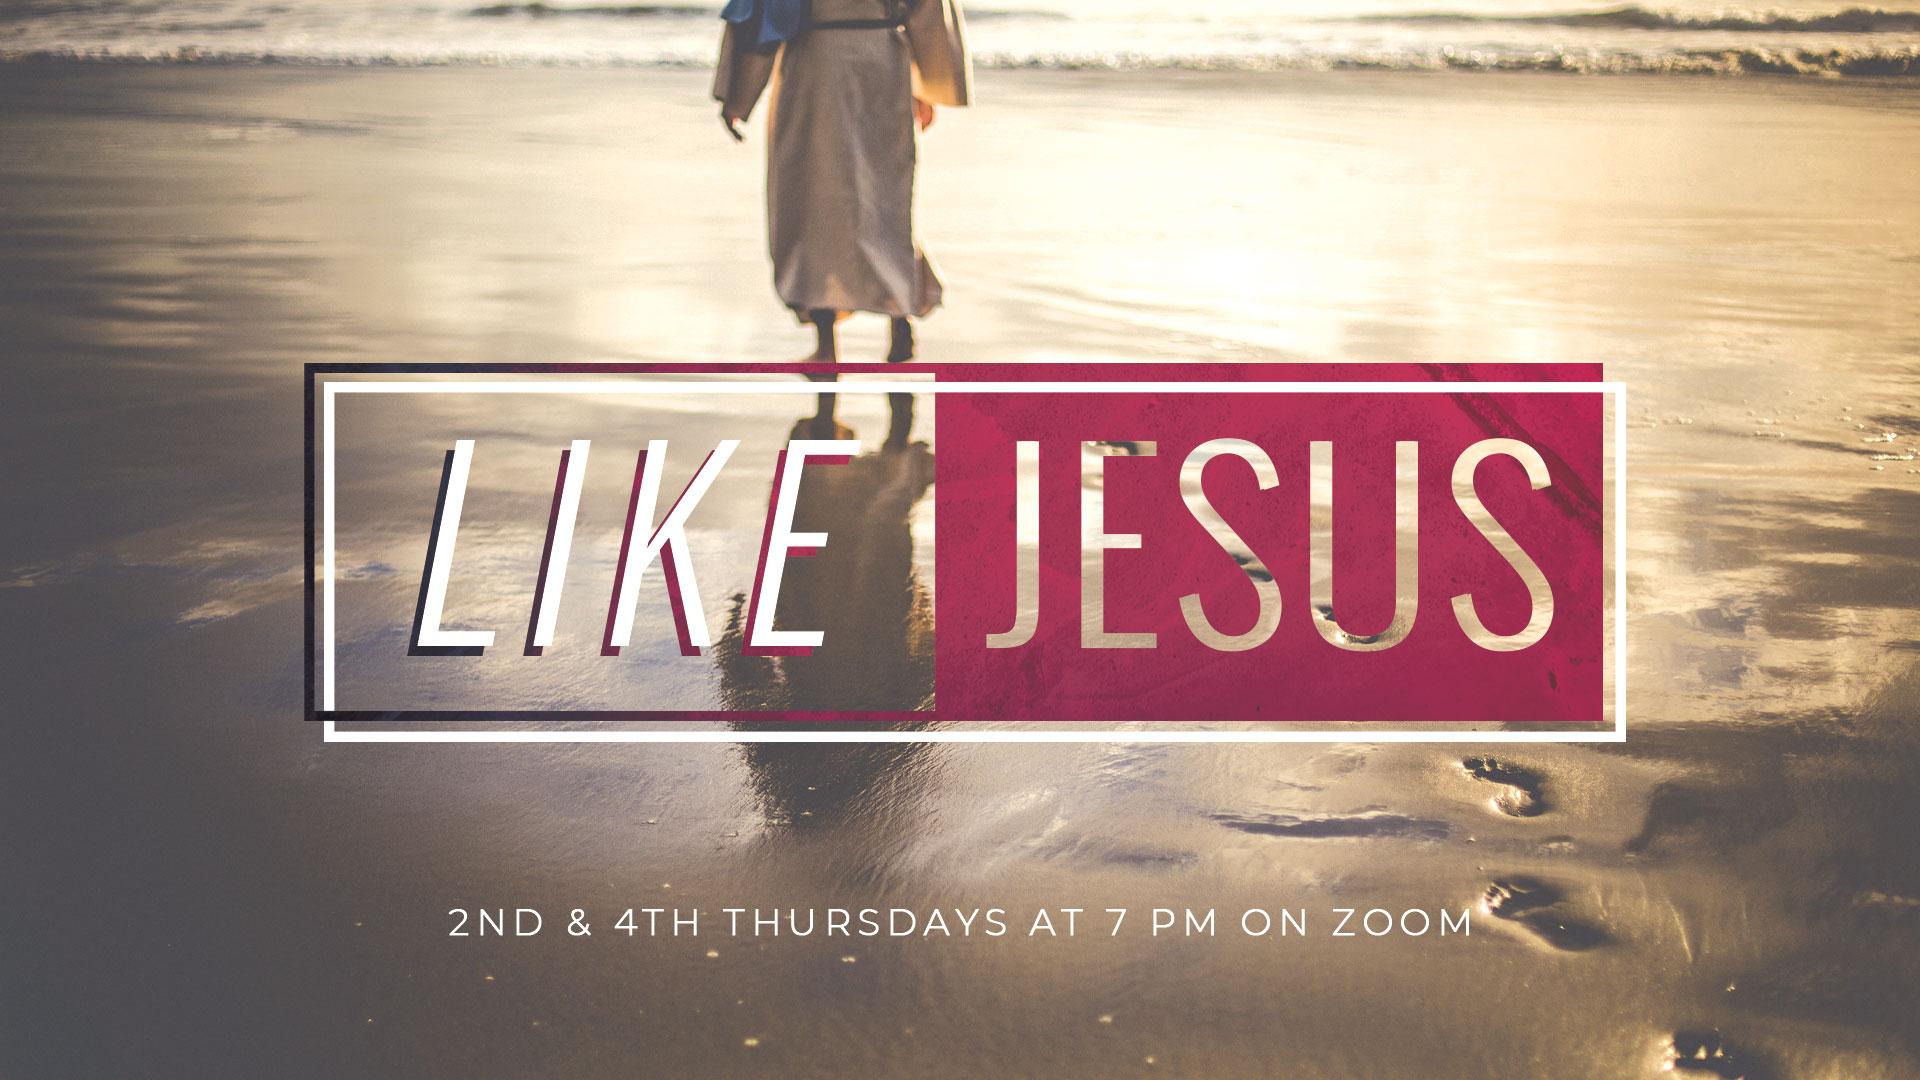 Man walking on beach with text saying Like Jesus